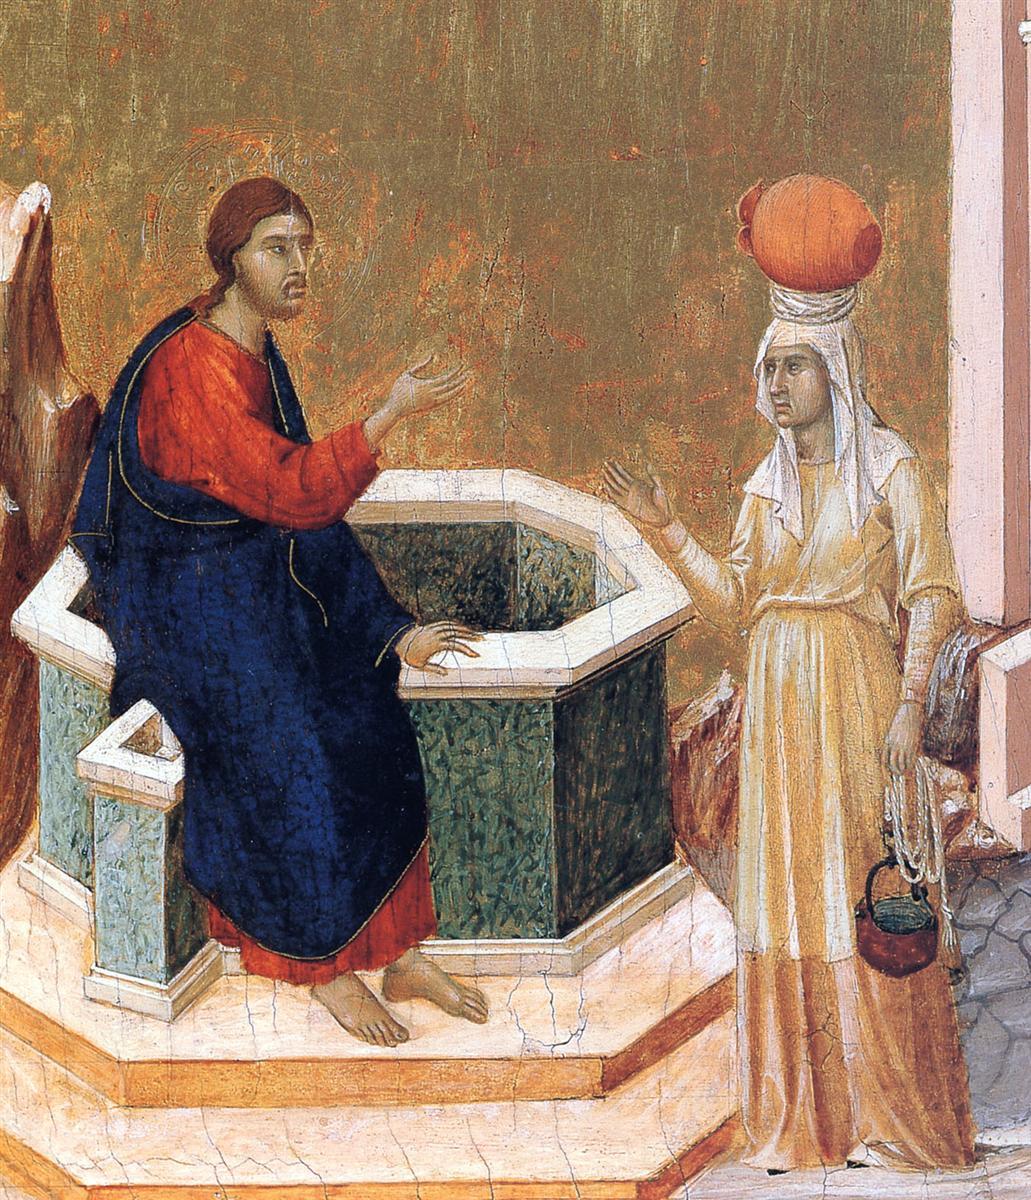 christ-and-the-samaritan-woman-fragment-1311.jpg!HD.jpg